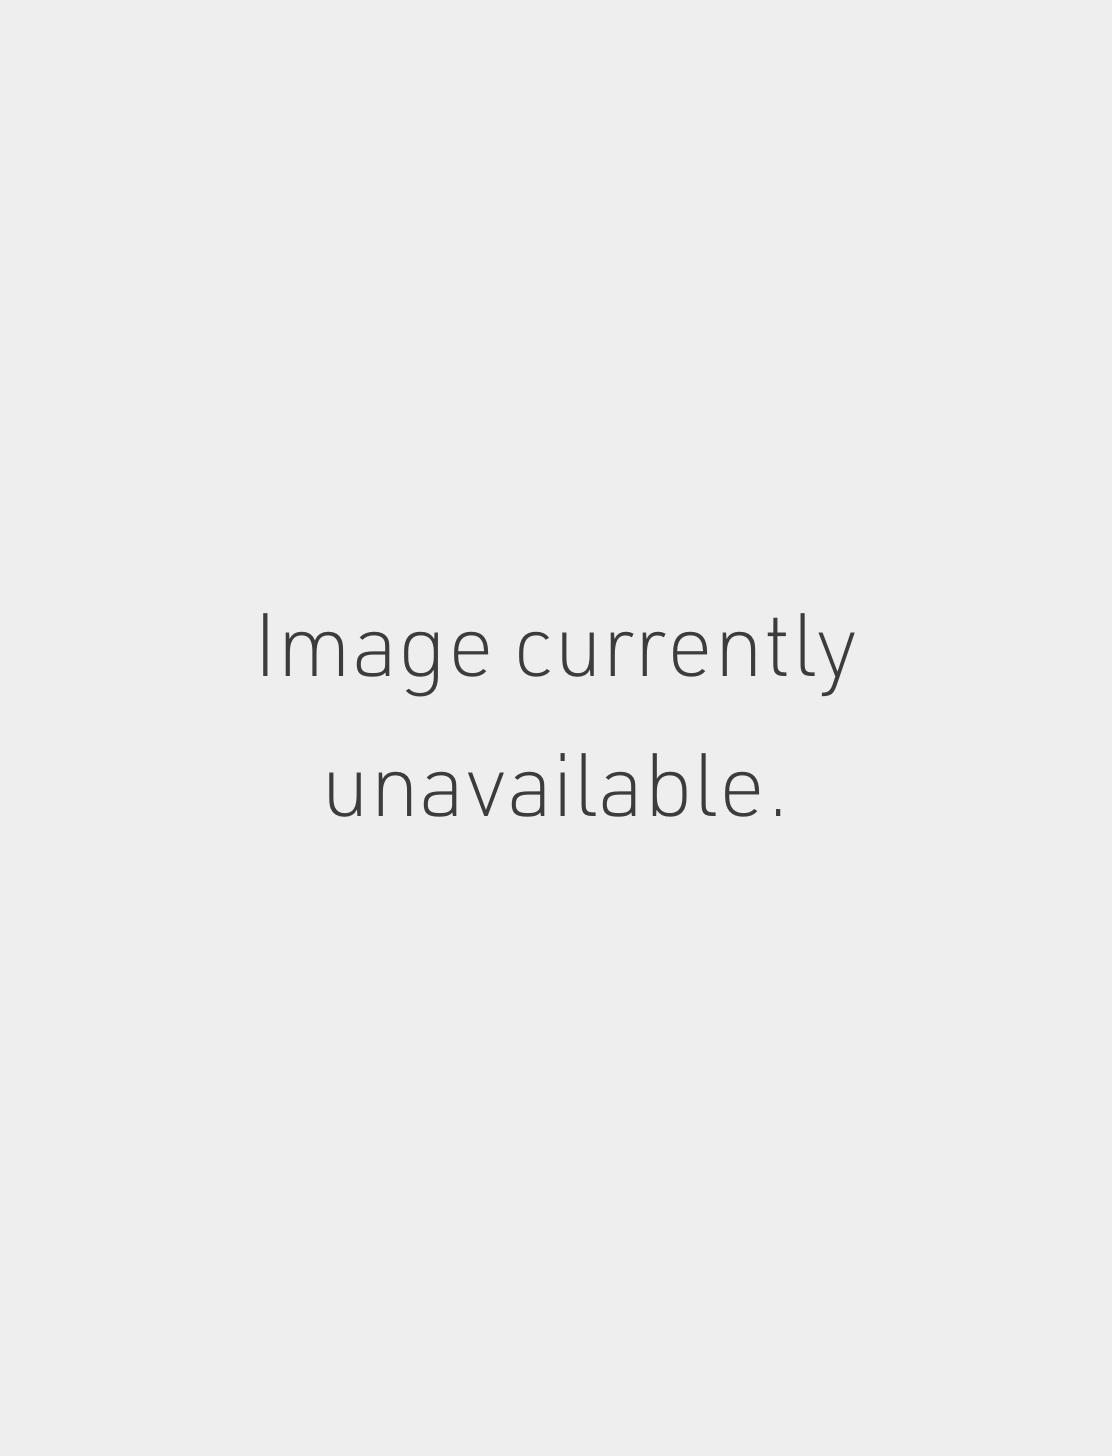 Diamond Right-Paisley Nostril Screw - WHITE GOLD - LEFT SIDE Image #1